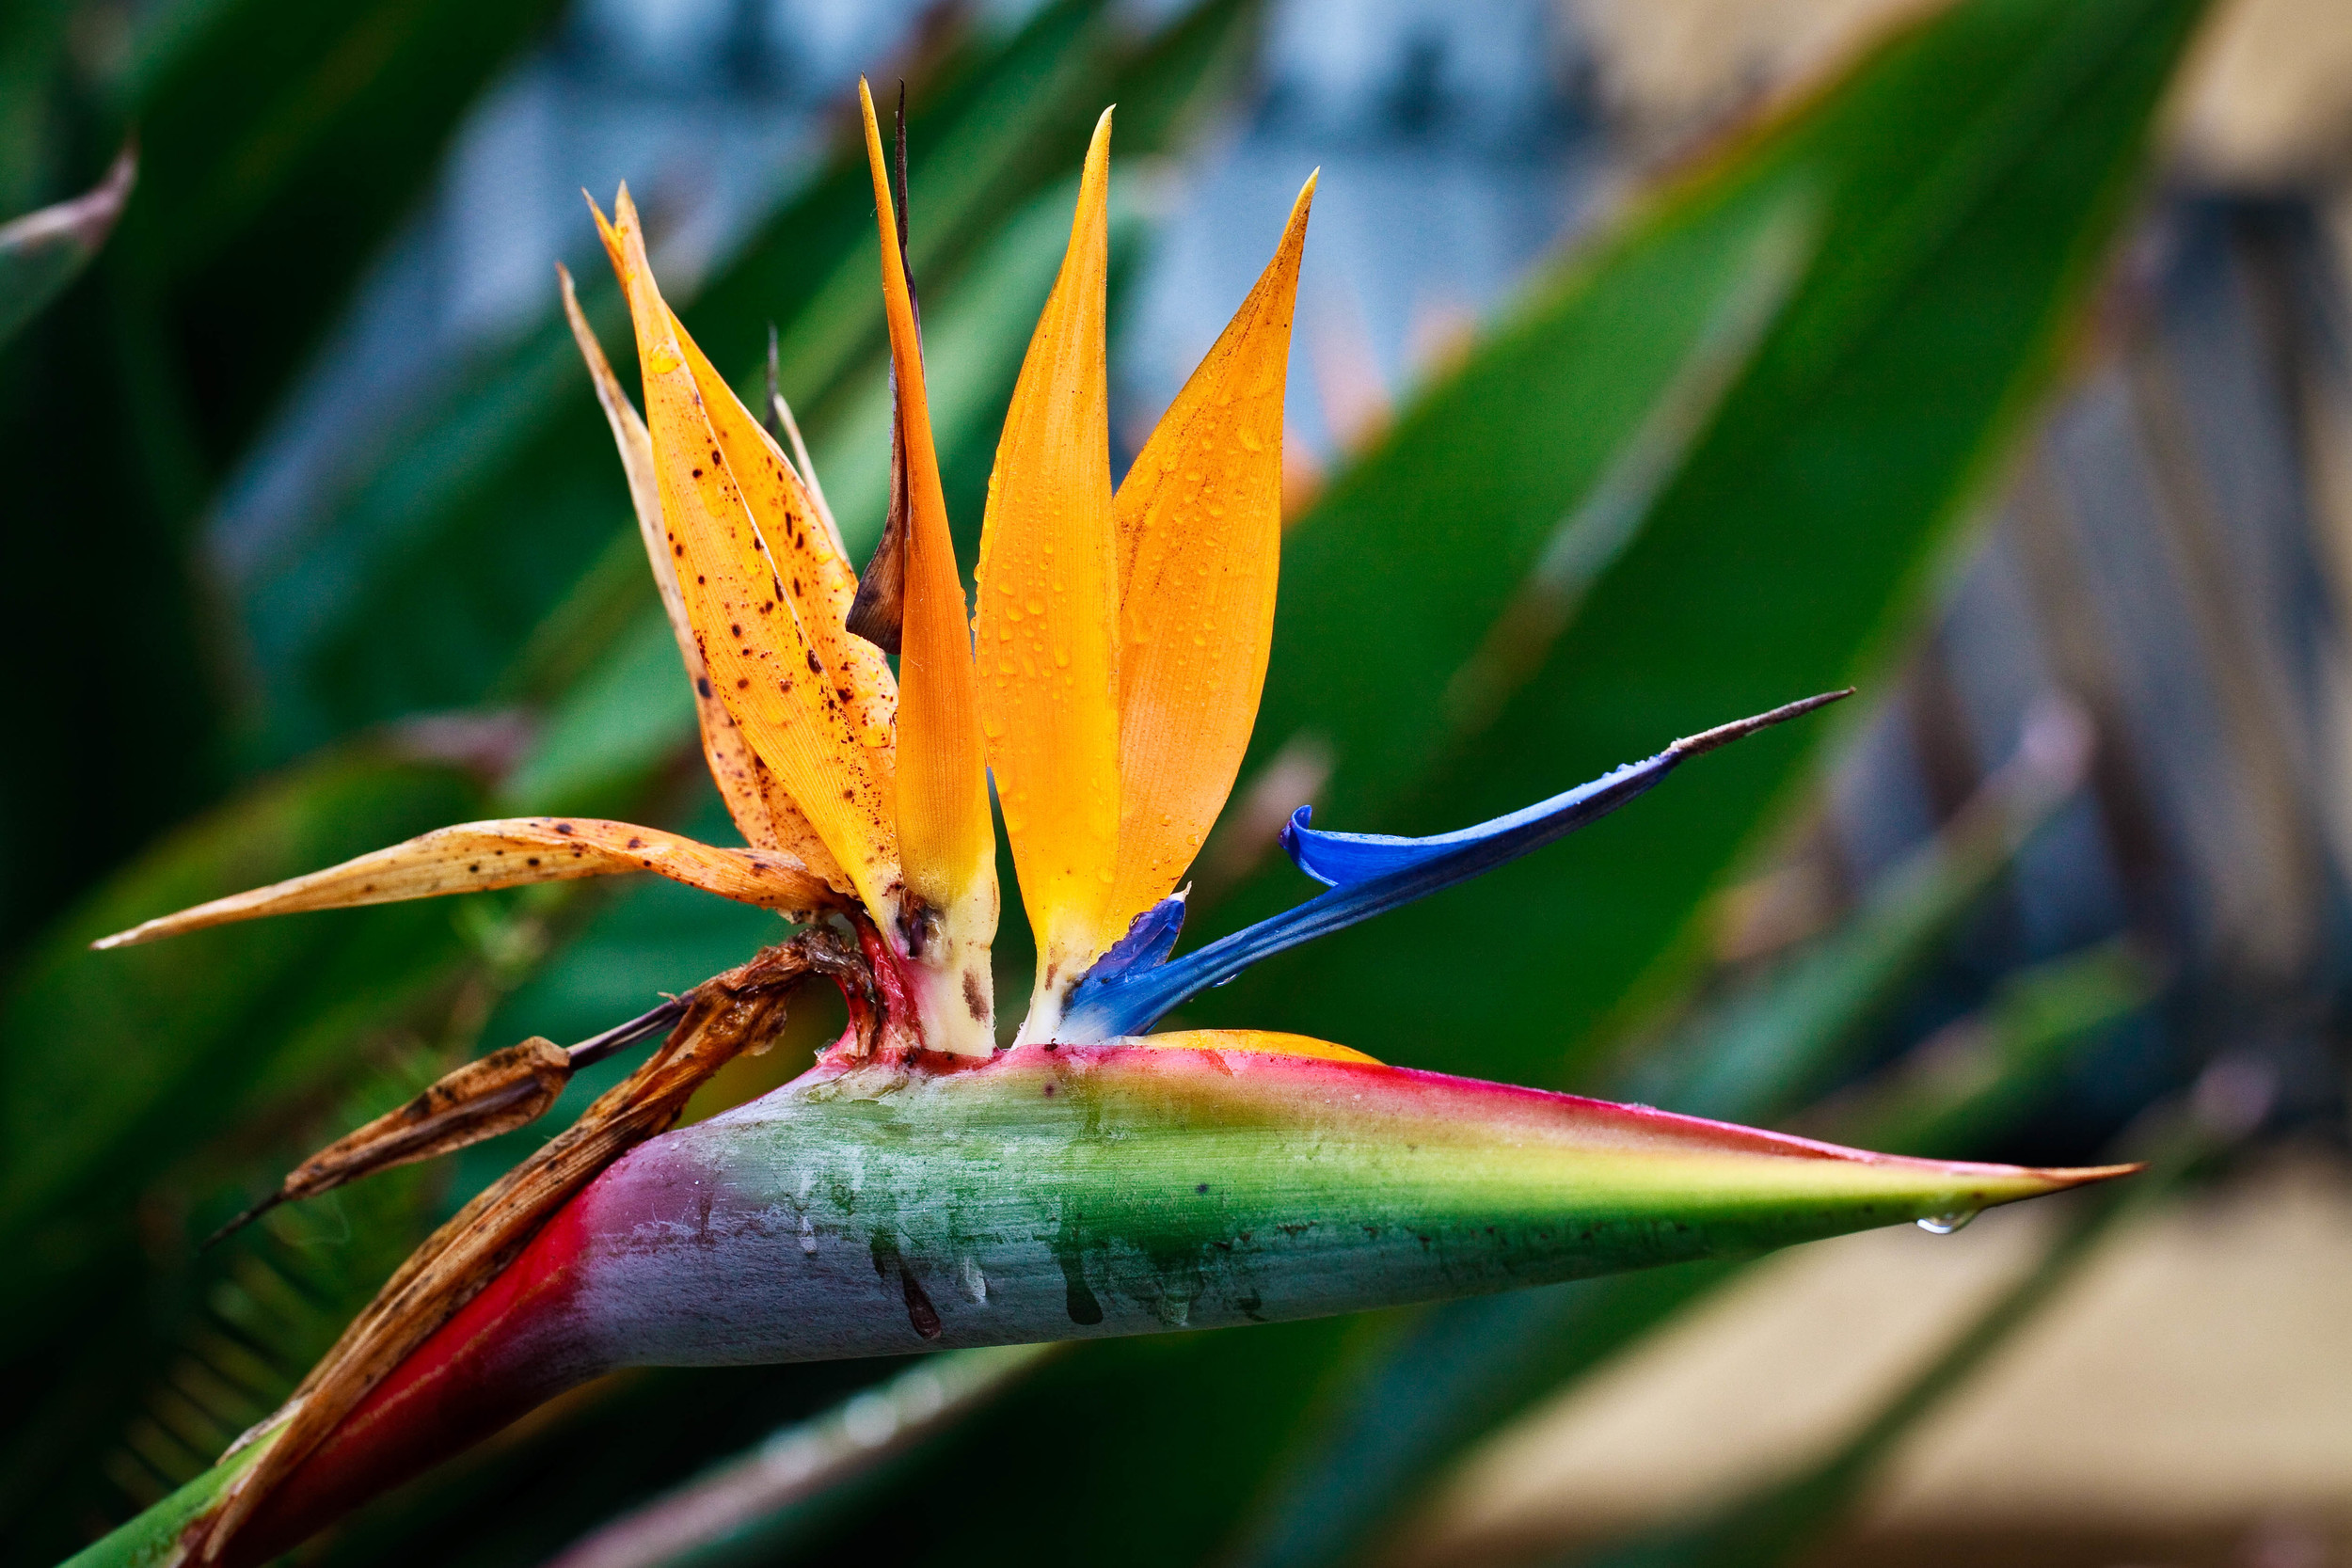 Flora or Fauna?, North Hollywood, California